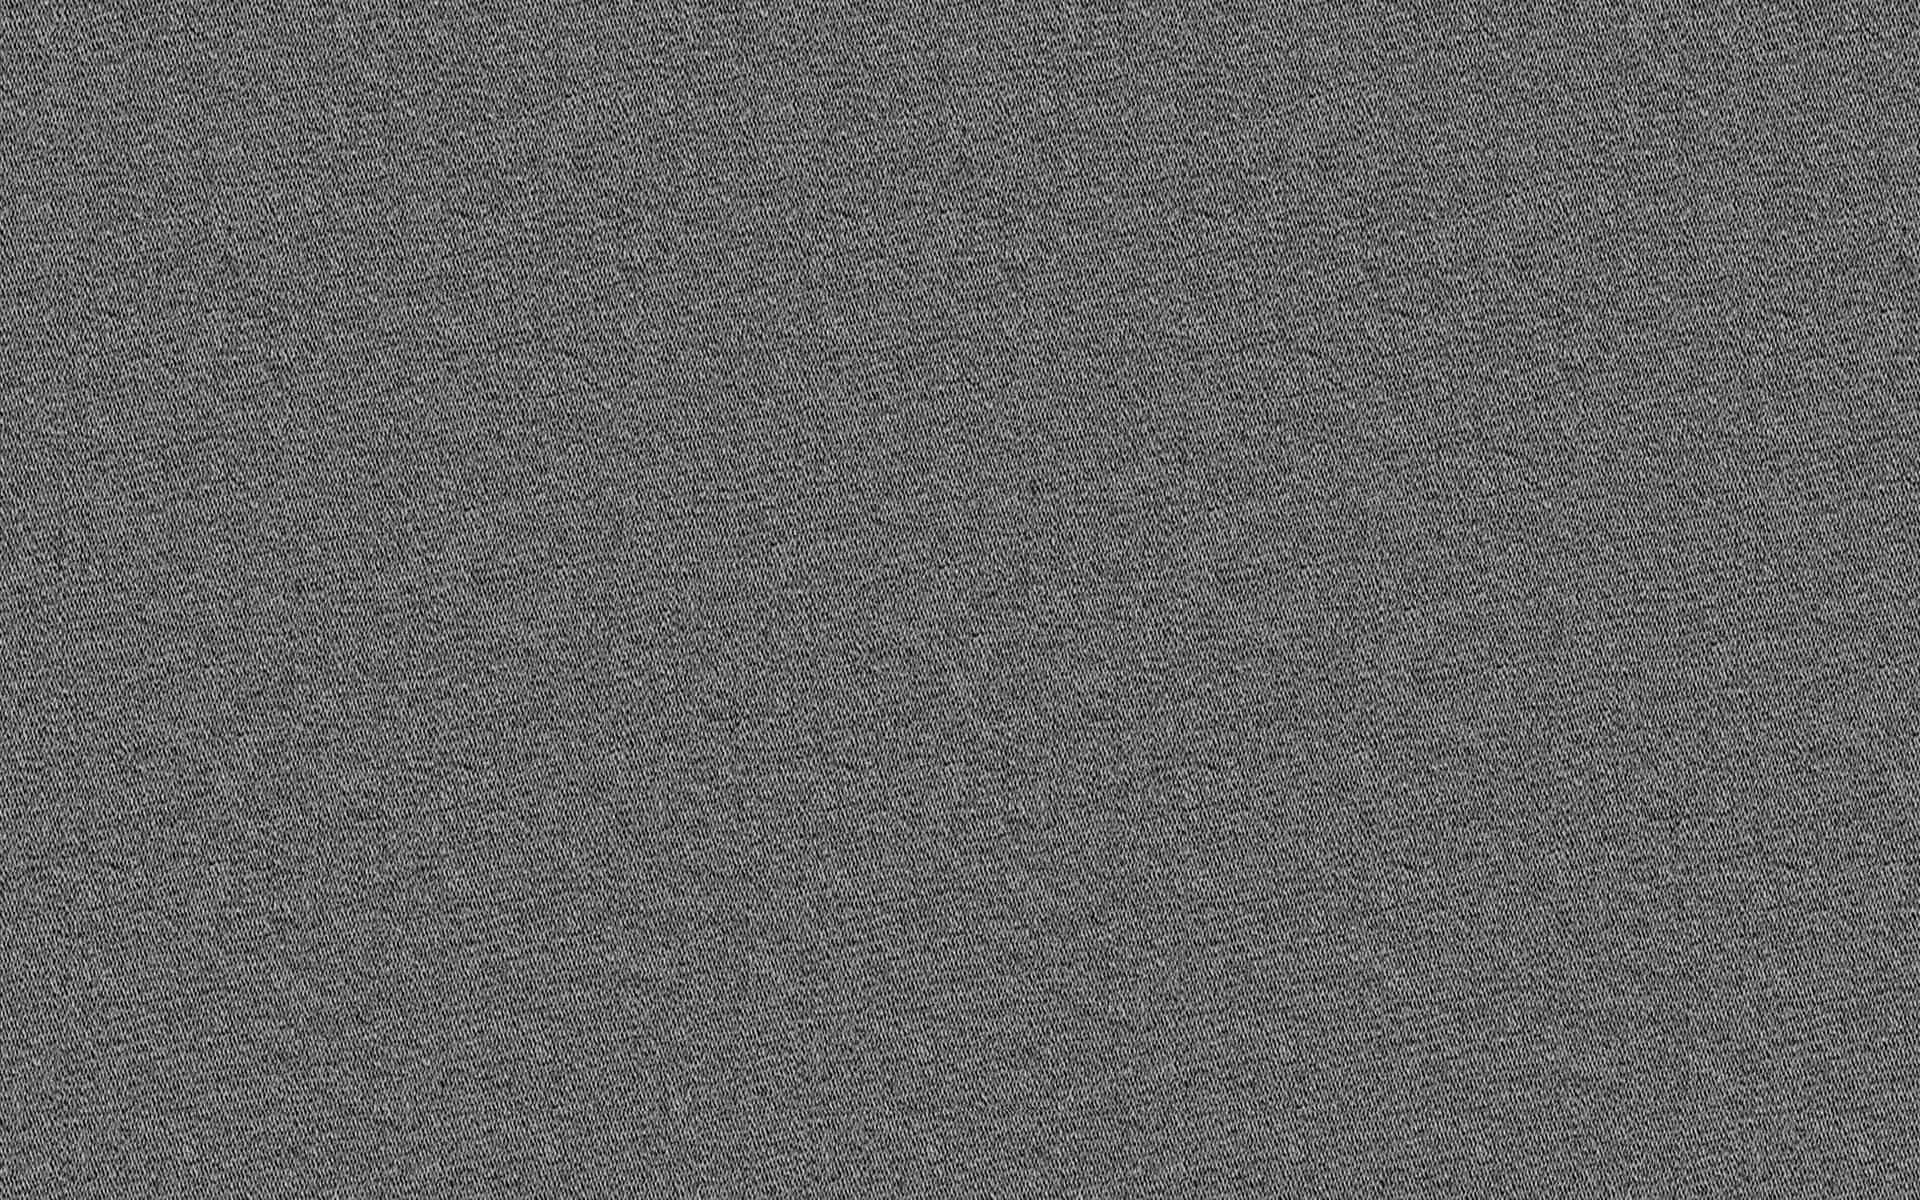 Texture Grey Background